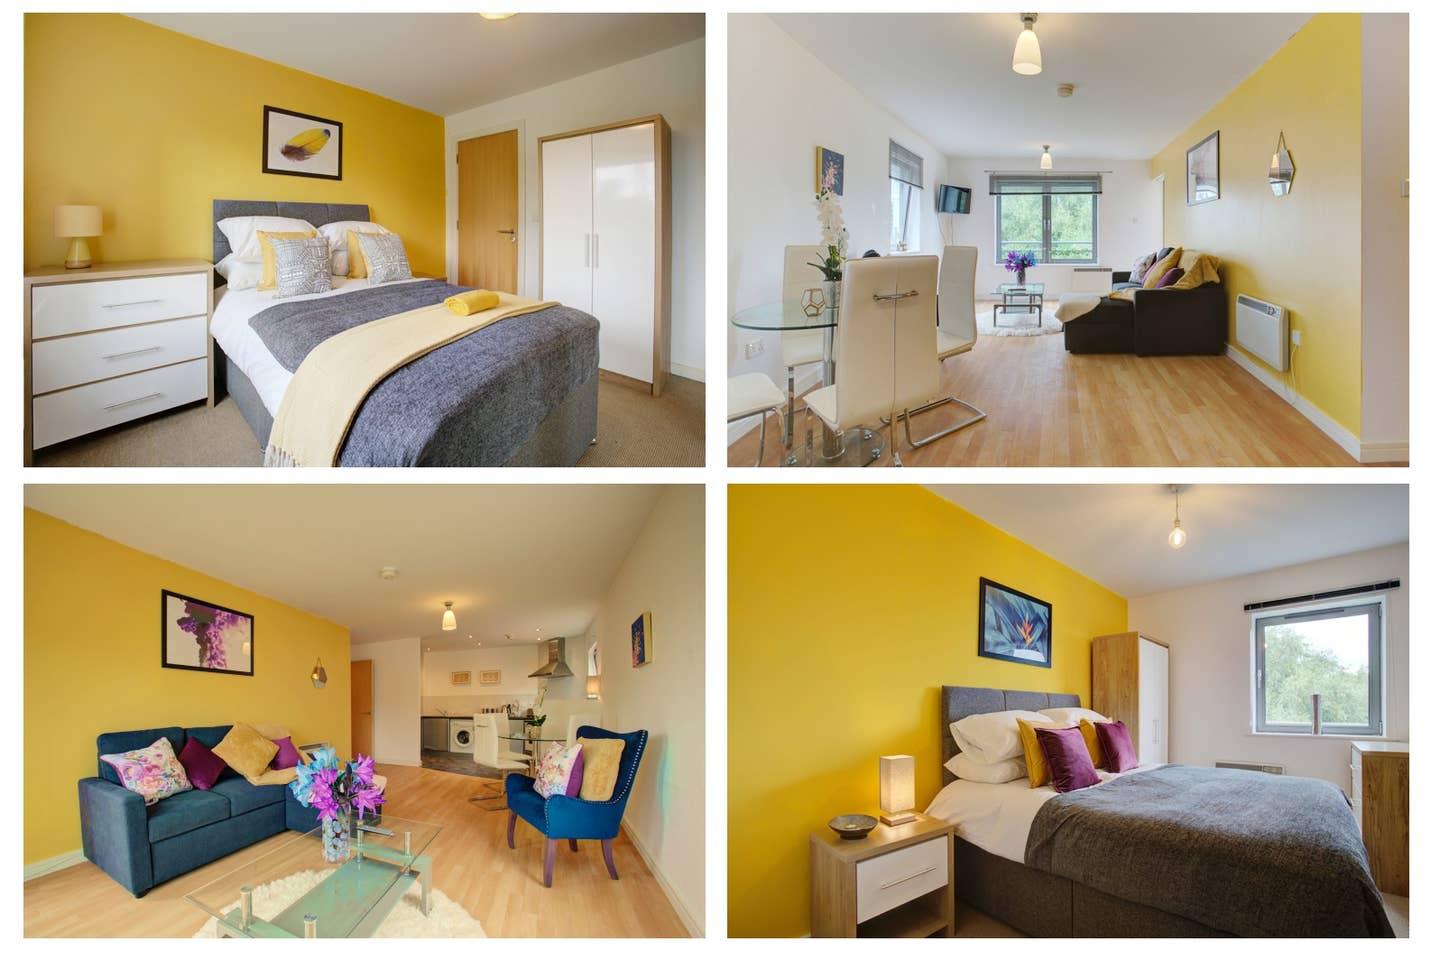 Acorn Serviced Apartments Manchester | BetterThanHotel